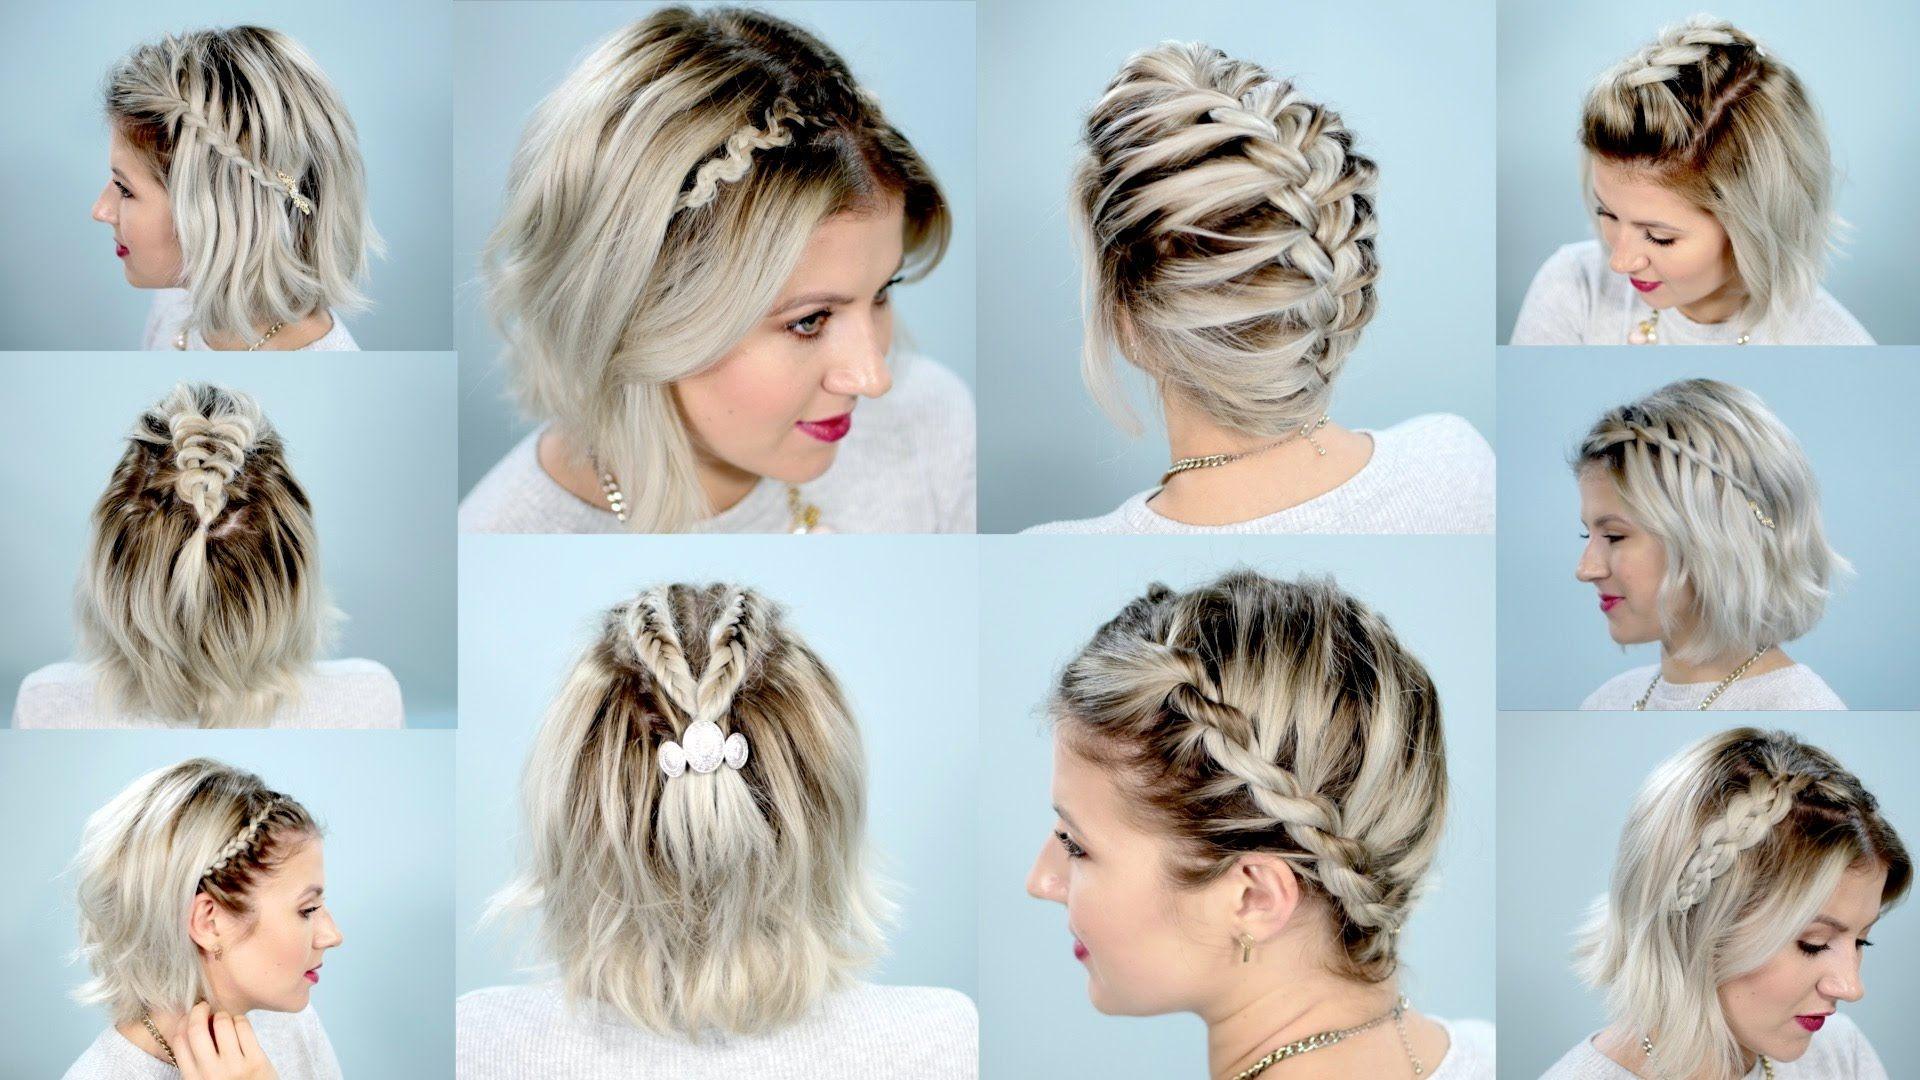 Hairstyles For Short Hair Braids #braids #hairstyles